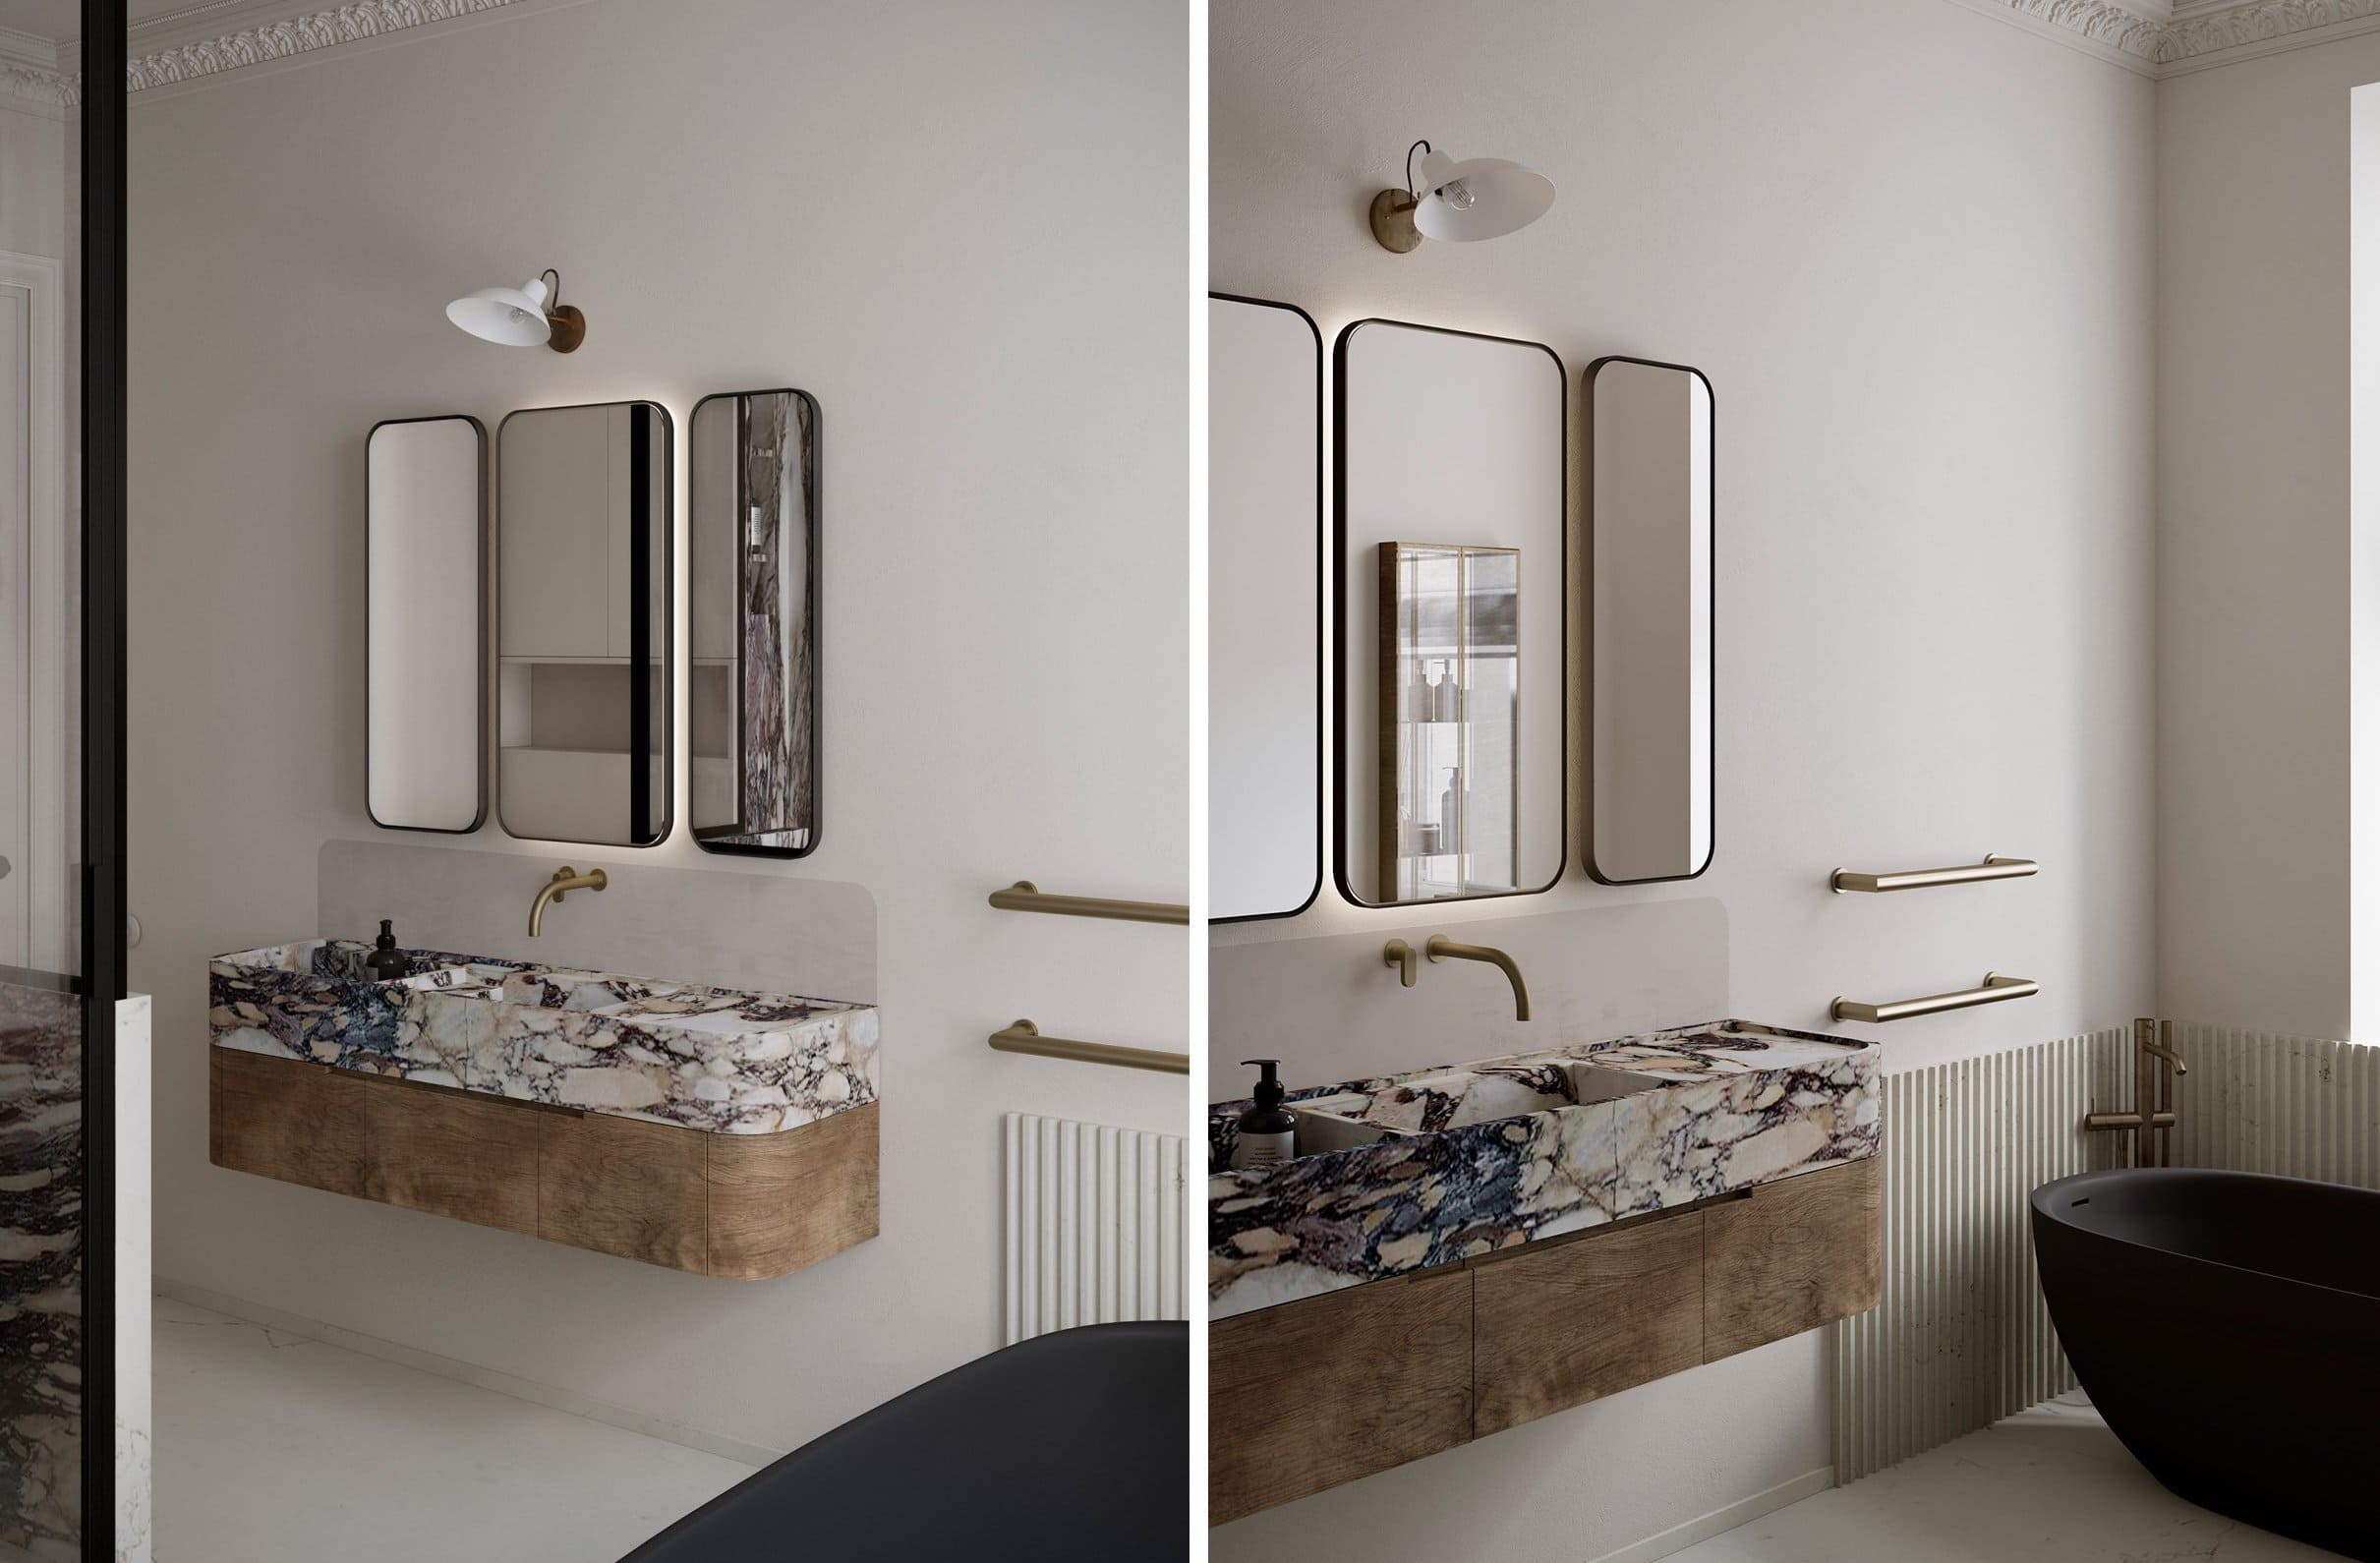 модный дизайн интерьера квартиры фото 22